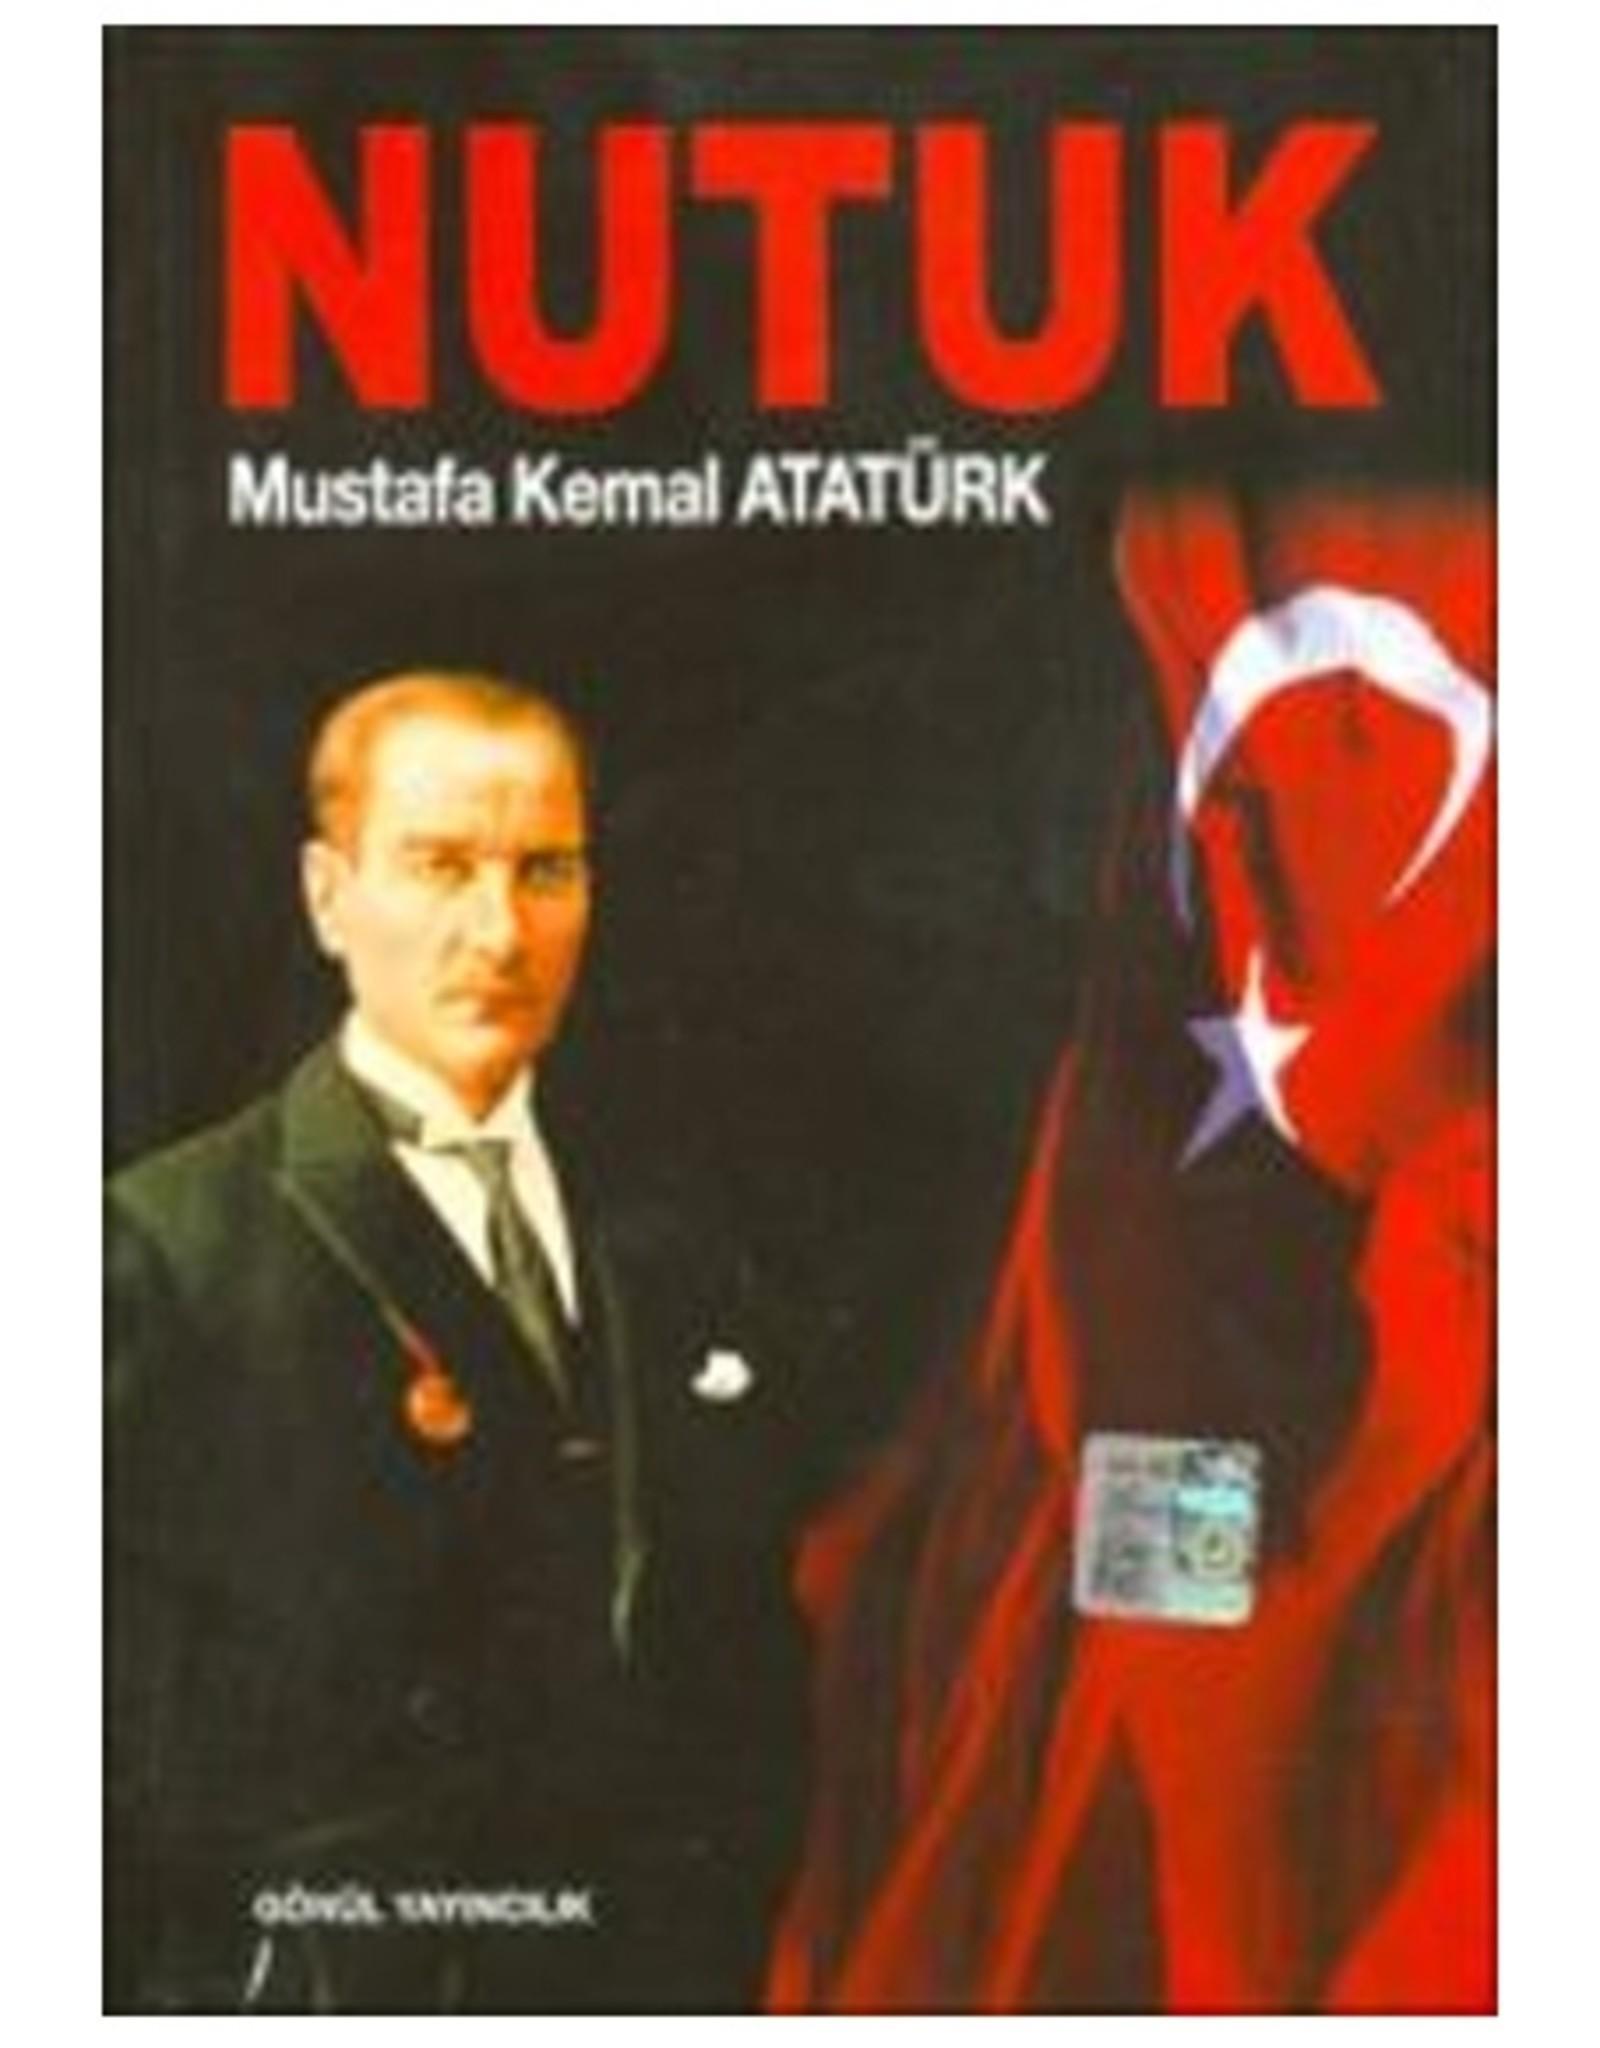 Mustafa Kemal Atatürk Nutuk